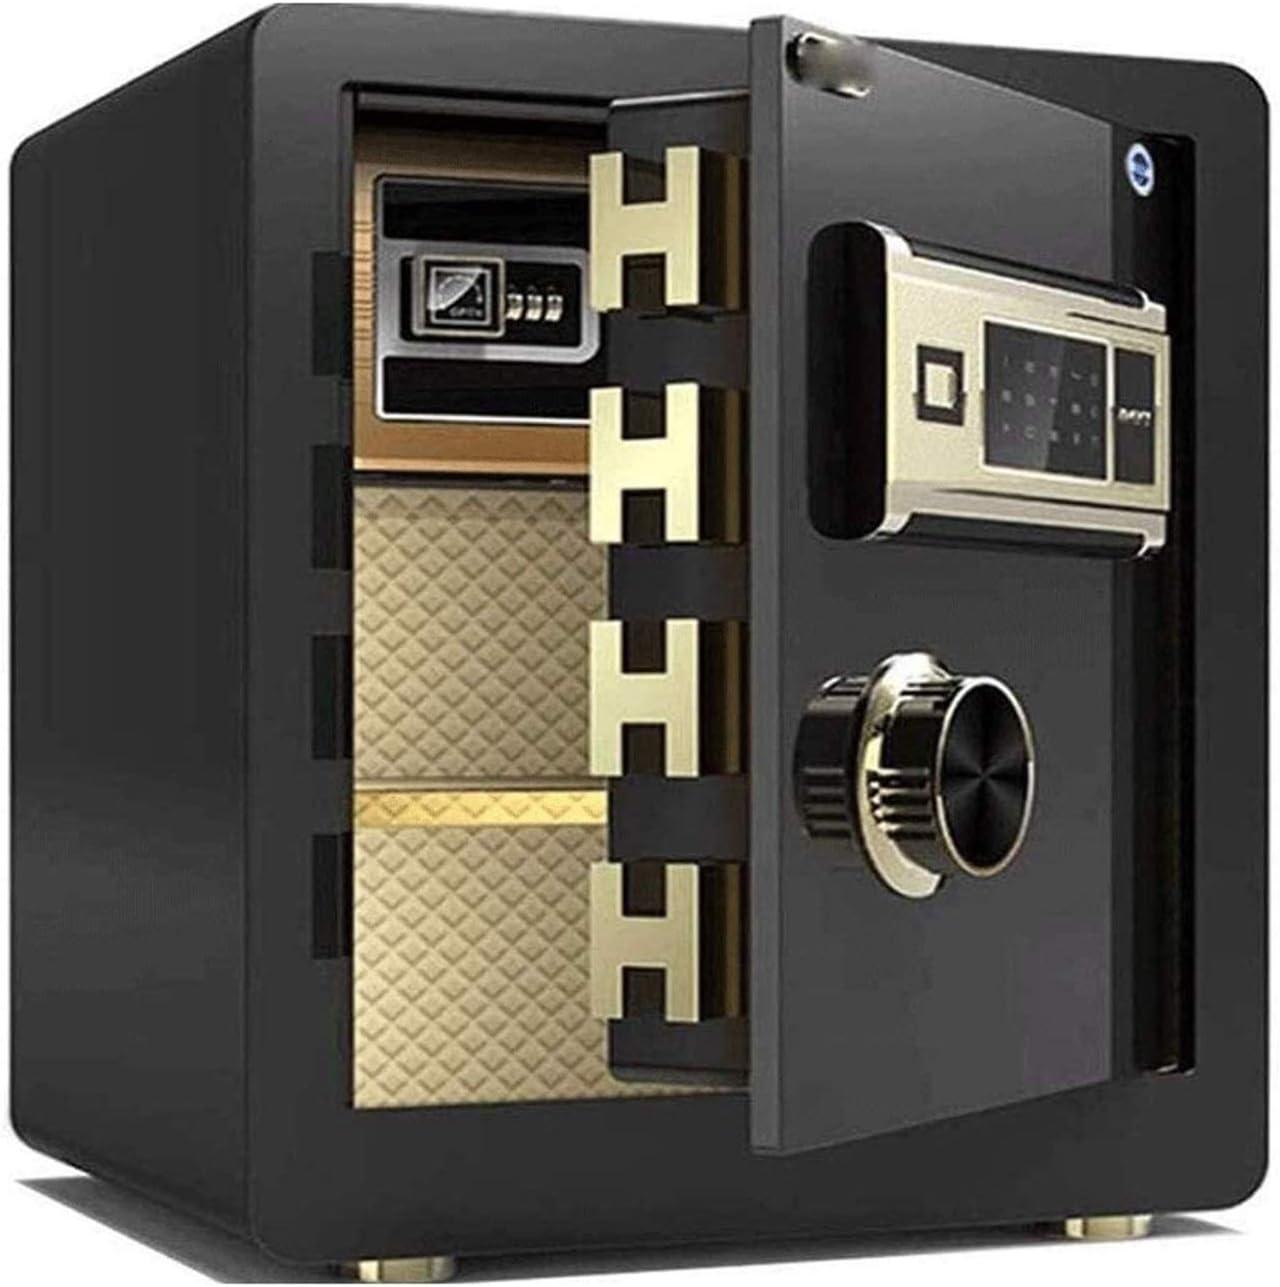 ELXSZJ XTZJ 5 ☆ very popular Security Home Feet Box-1.4 Cubic Safe Portland Mall